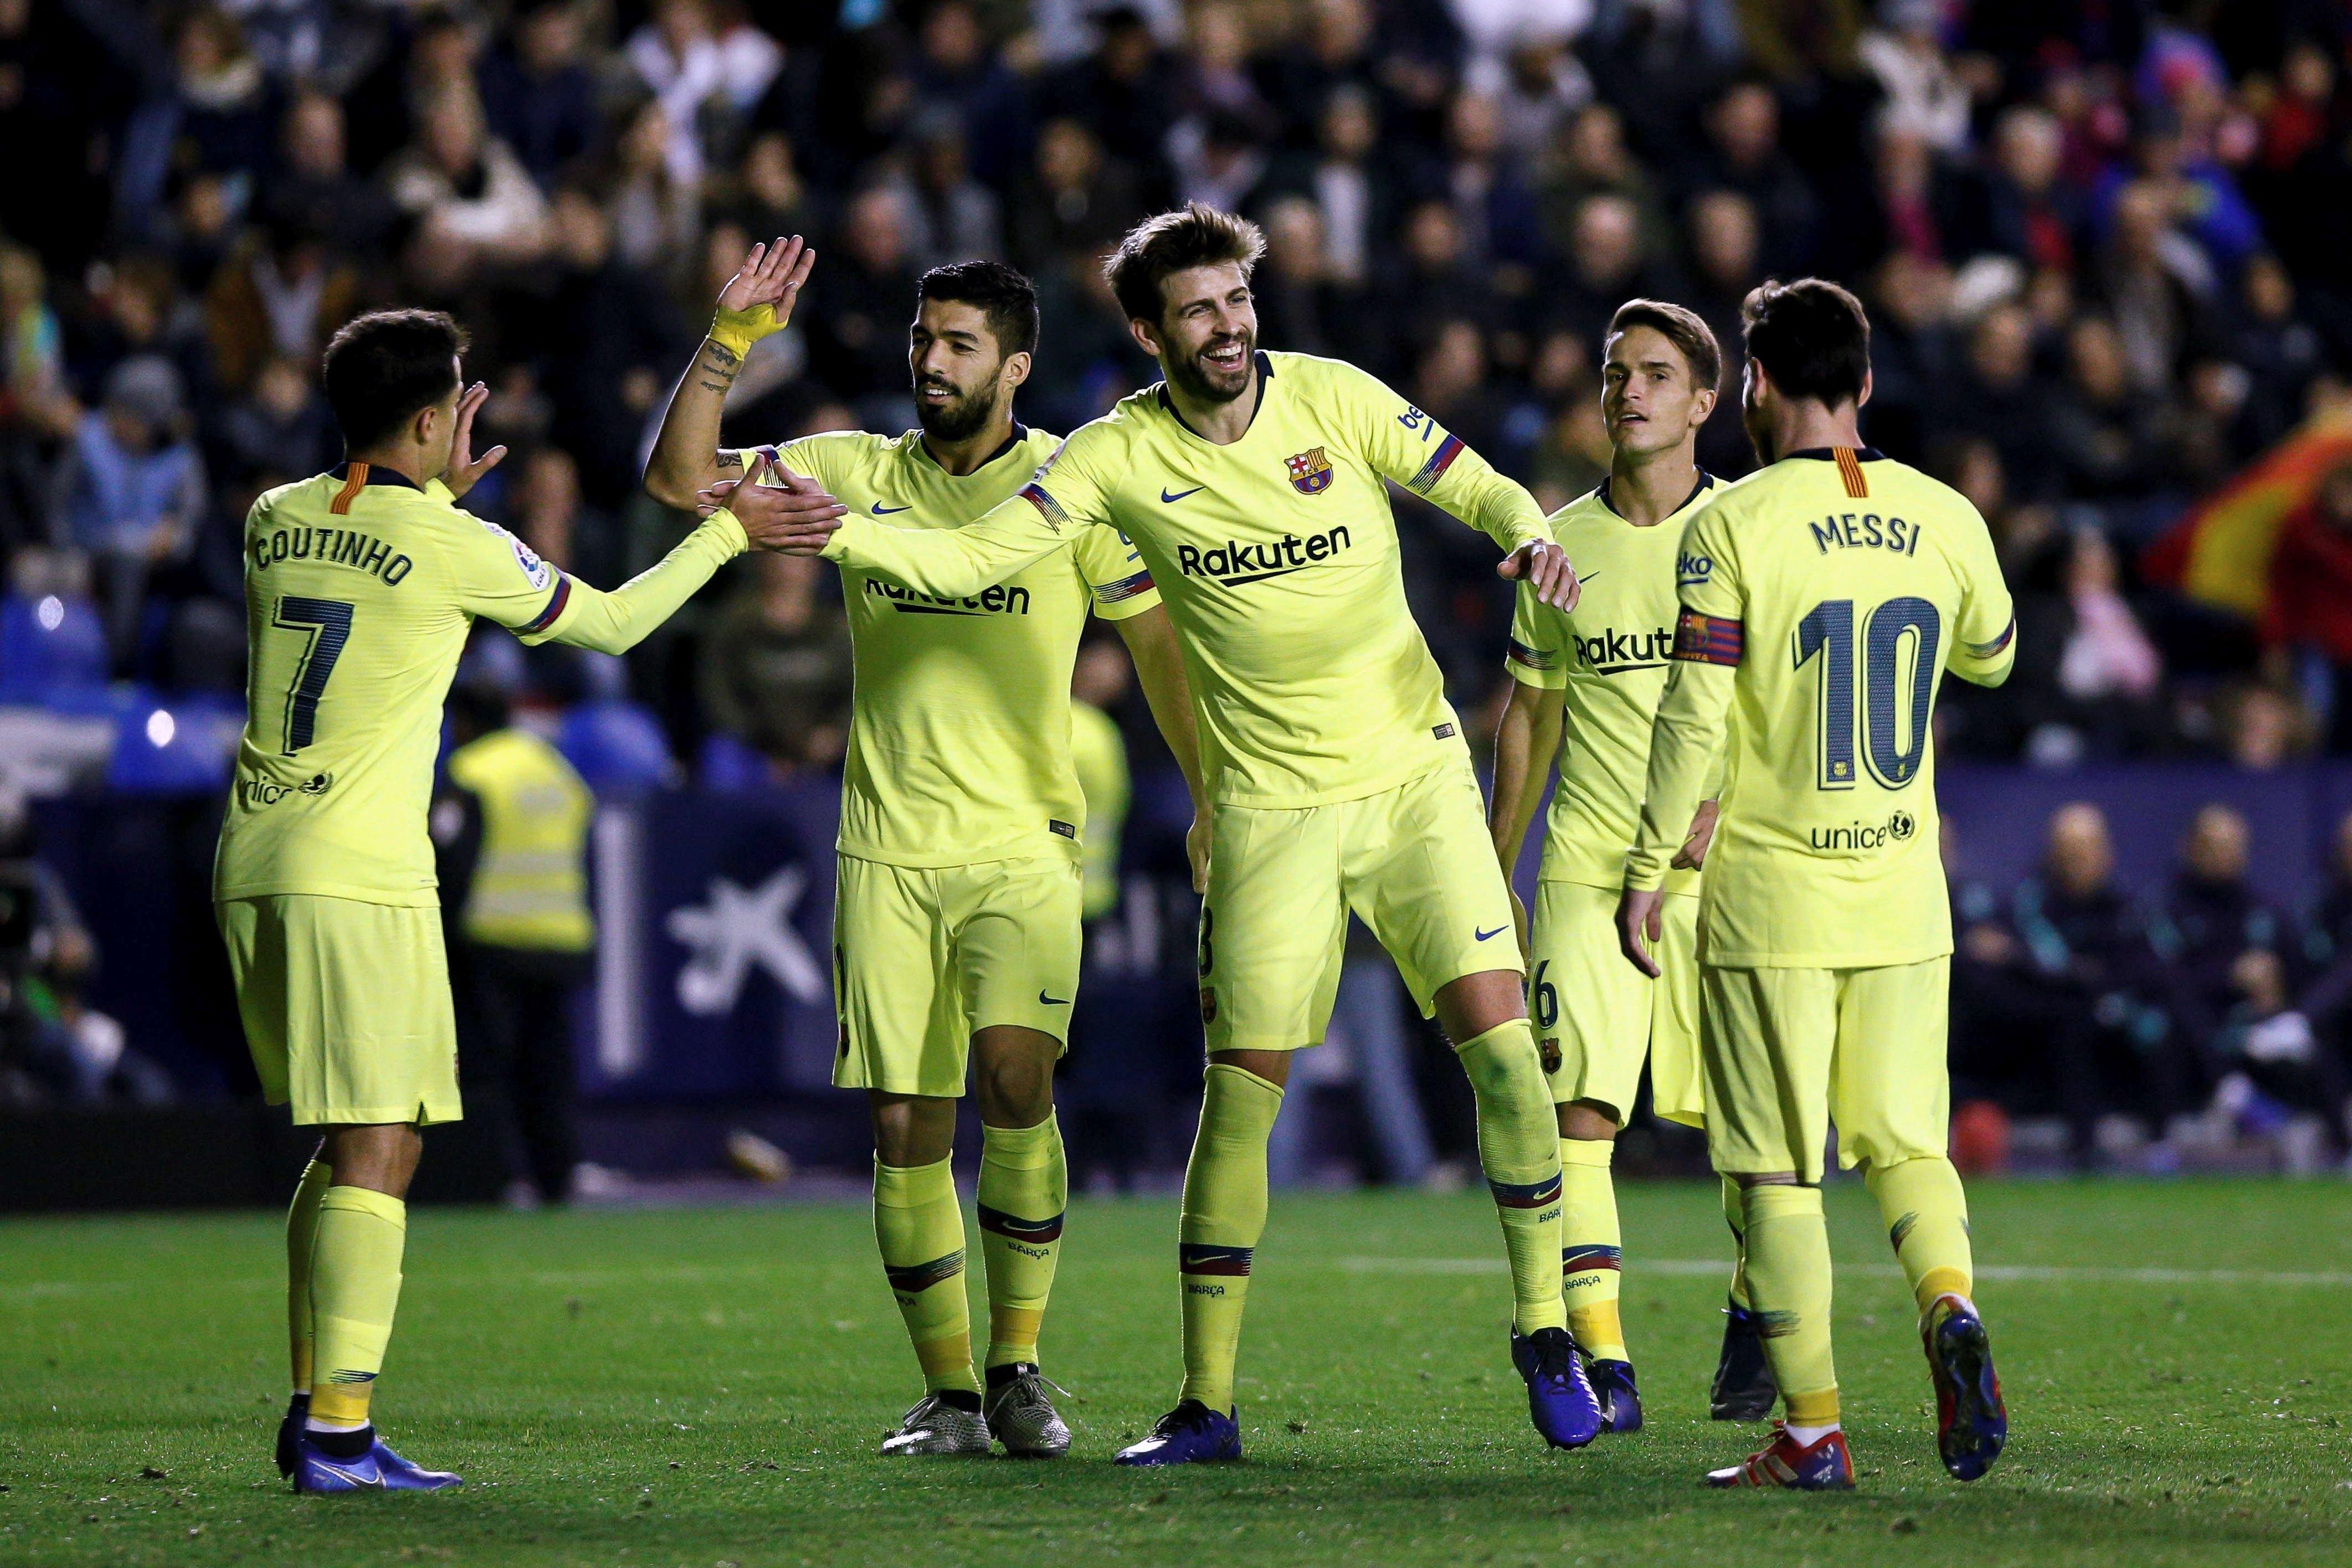 Gerard Piqué Llevant Barça EFE